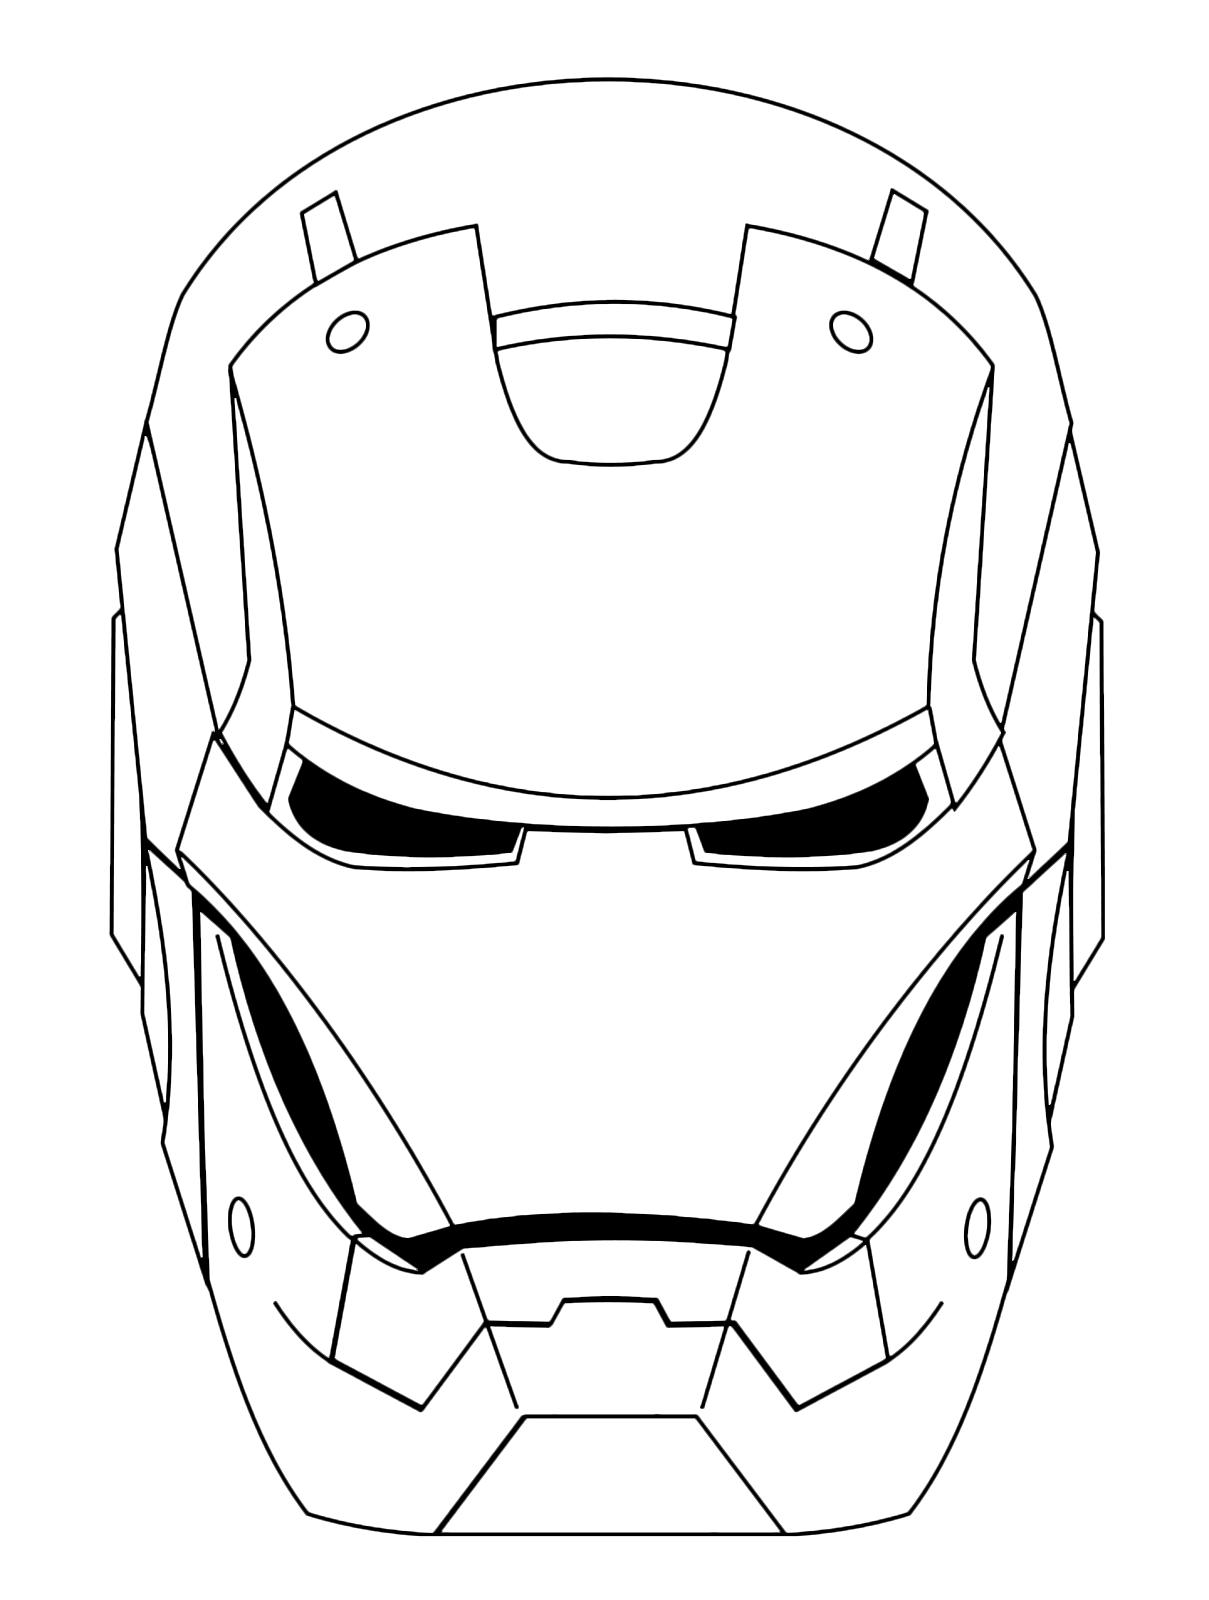 Iron Man - The Iron Man head